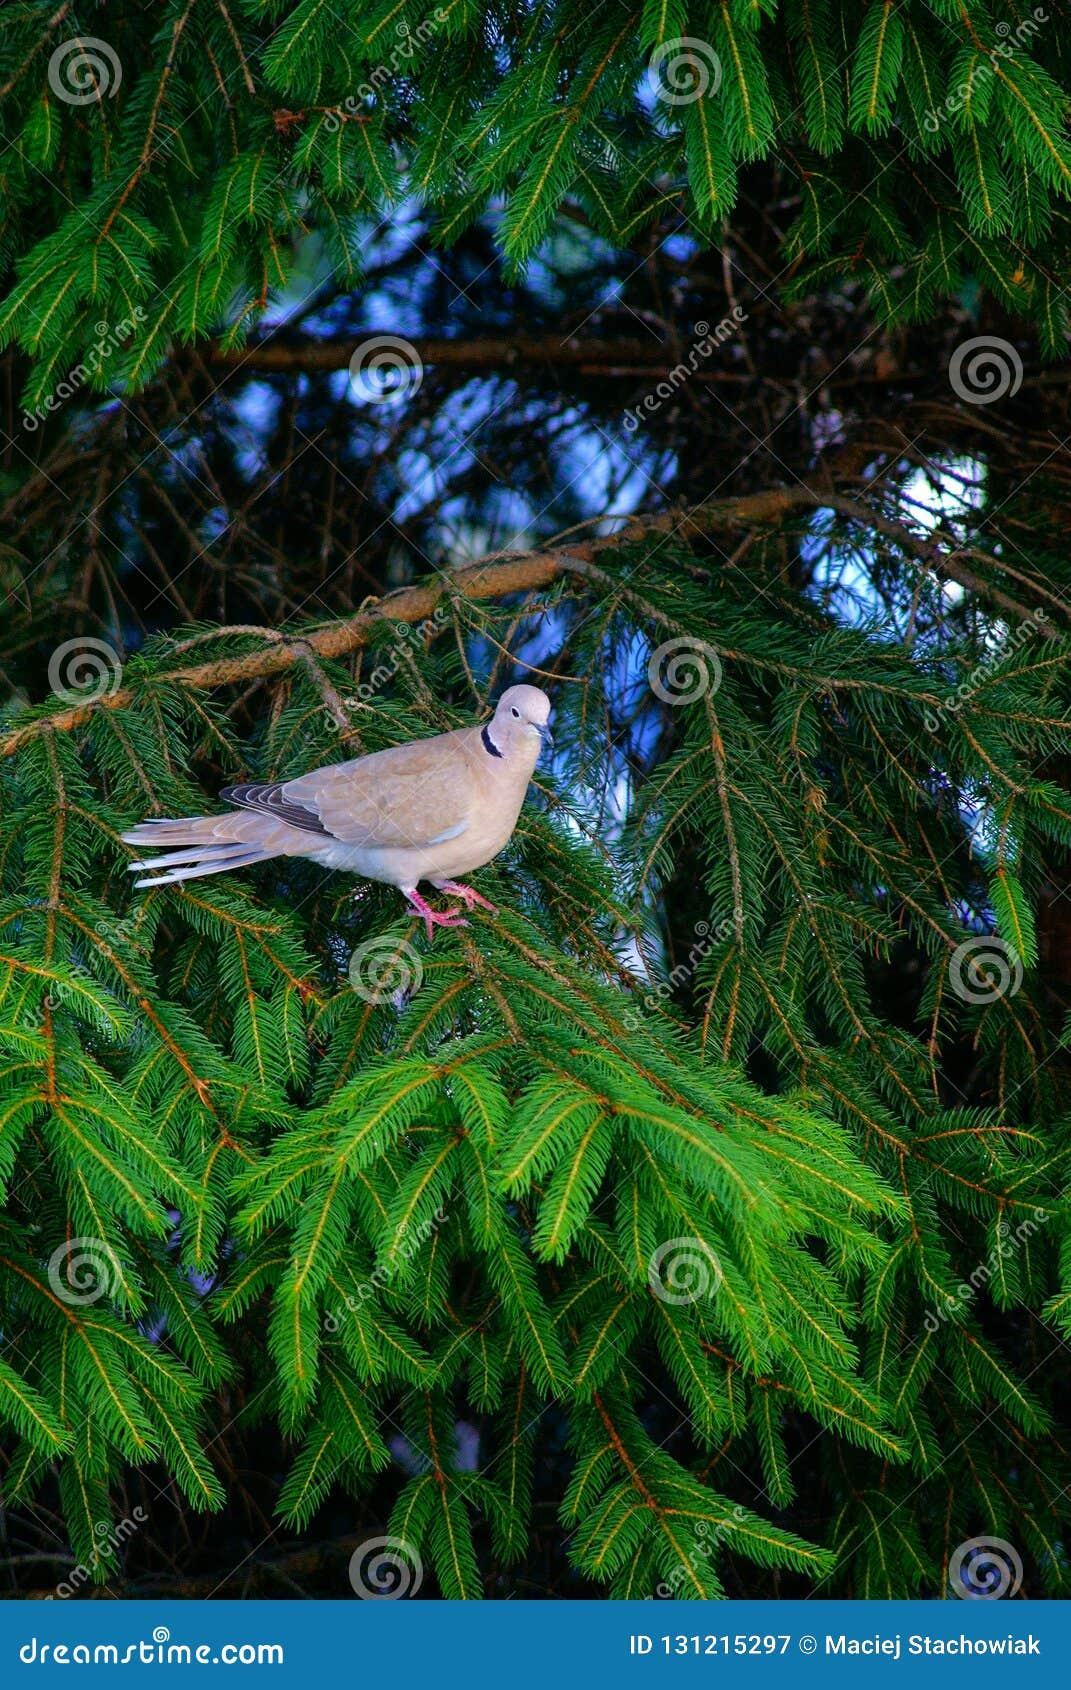 Eurasian collared dove sitting on a tree stump, Streptopelia decaocto